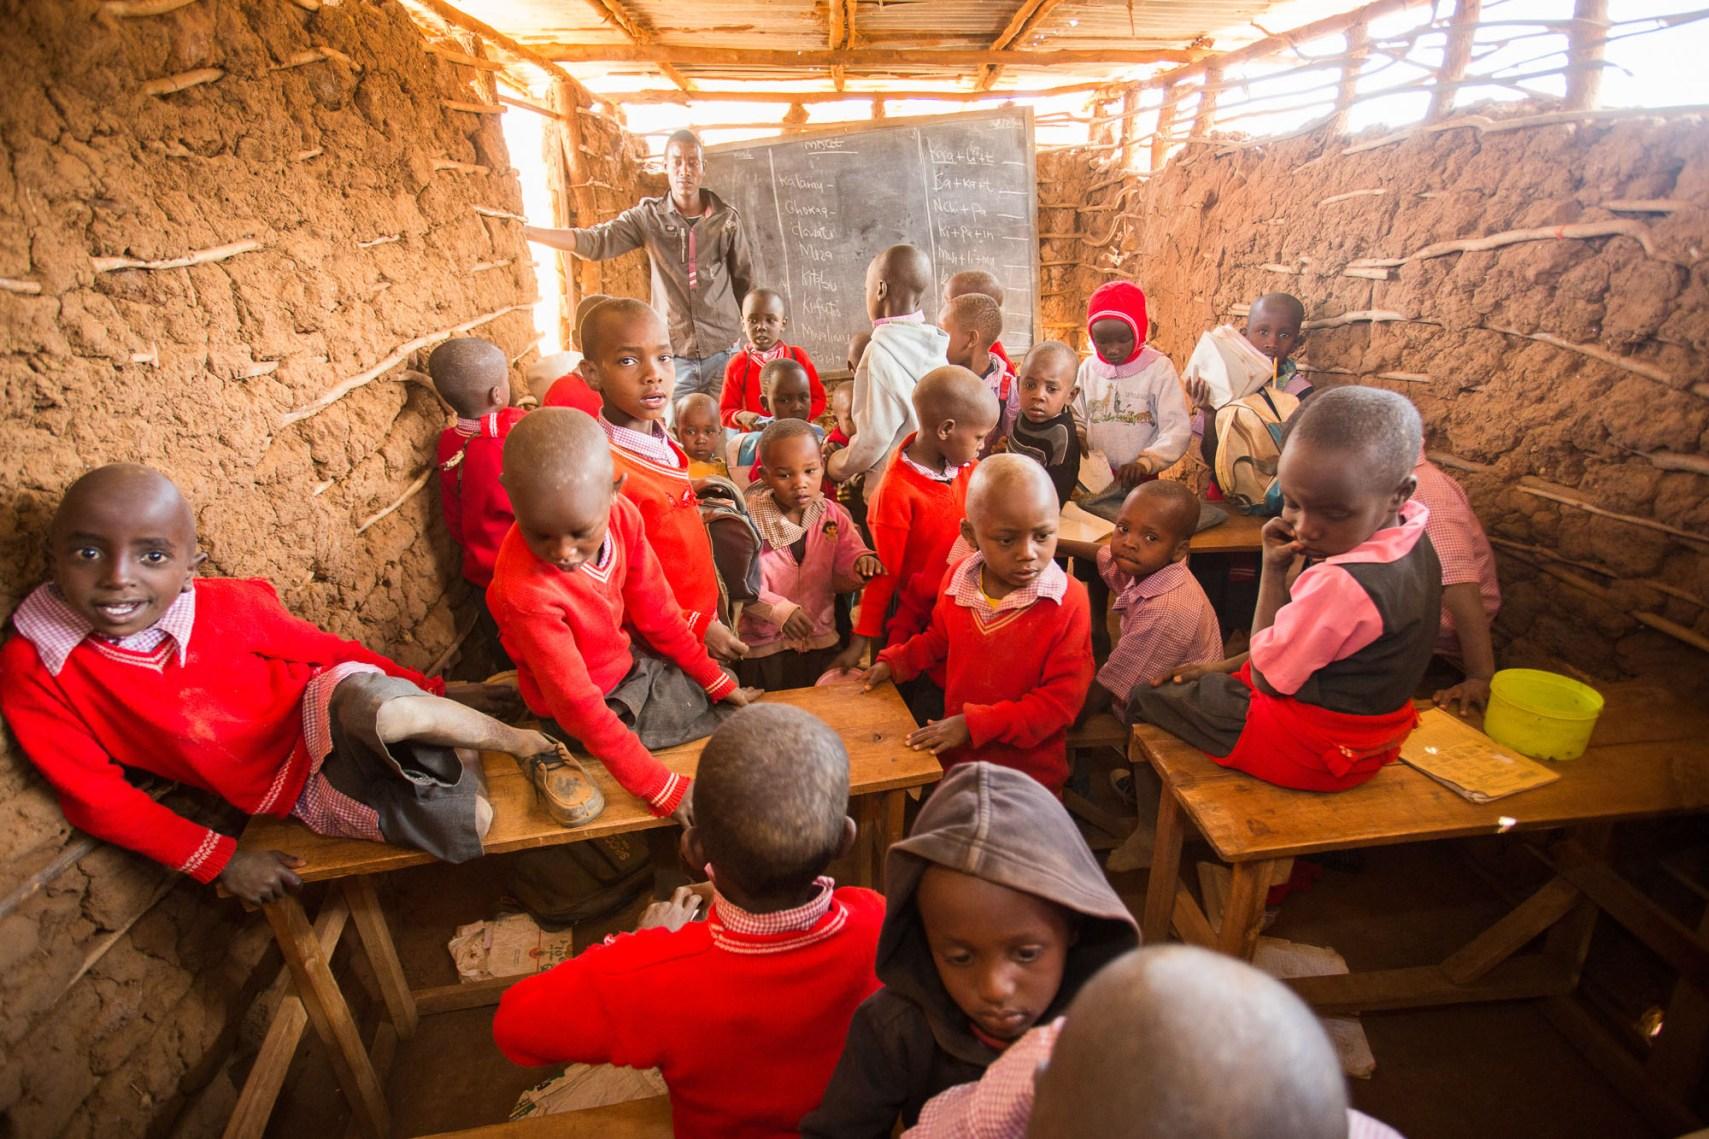 Students learn in a crowded classroom in Kajiado County, Kenya.